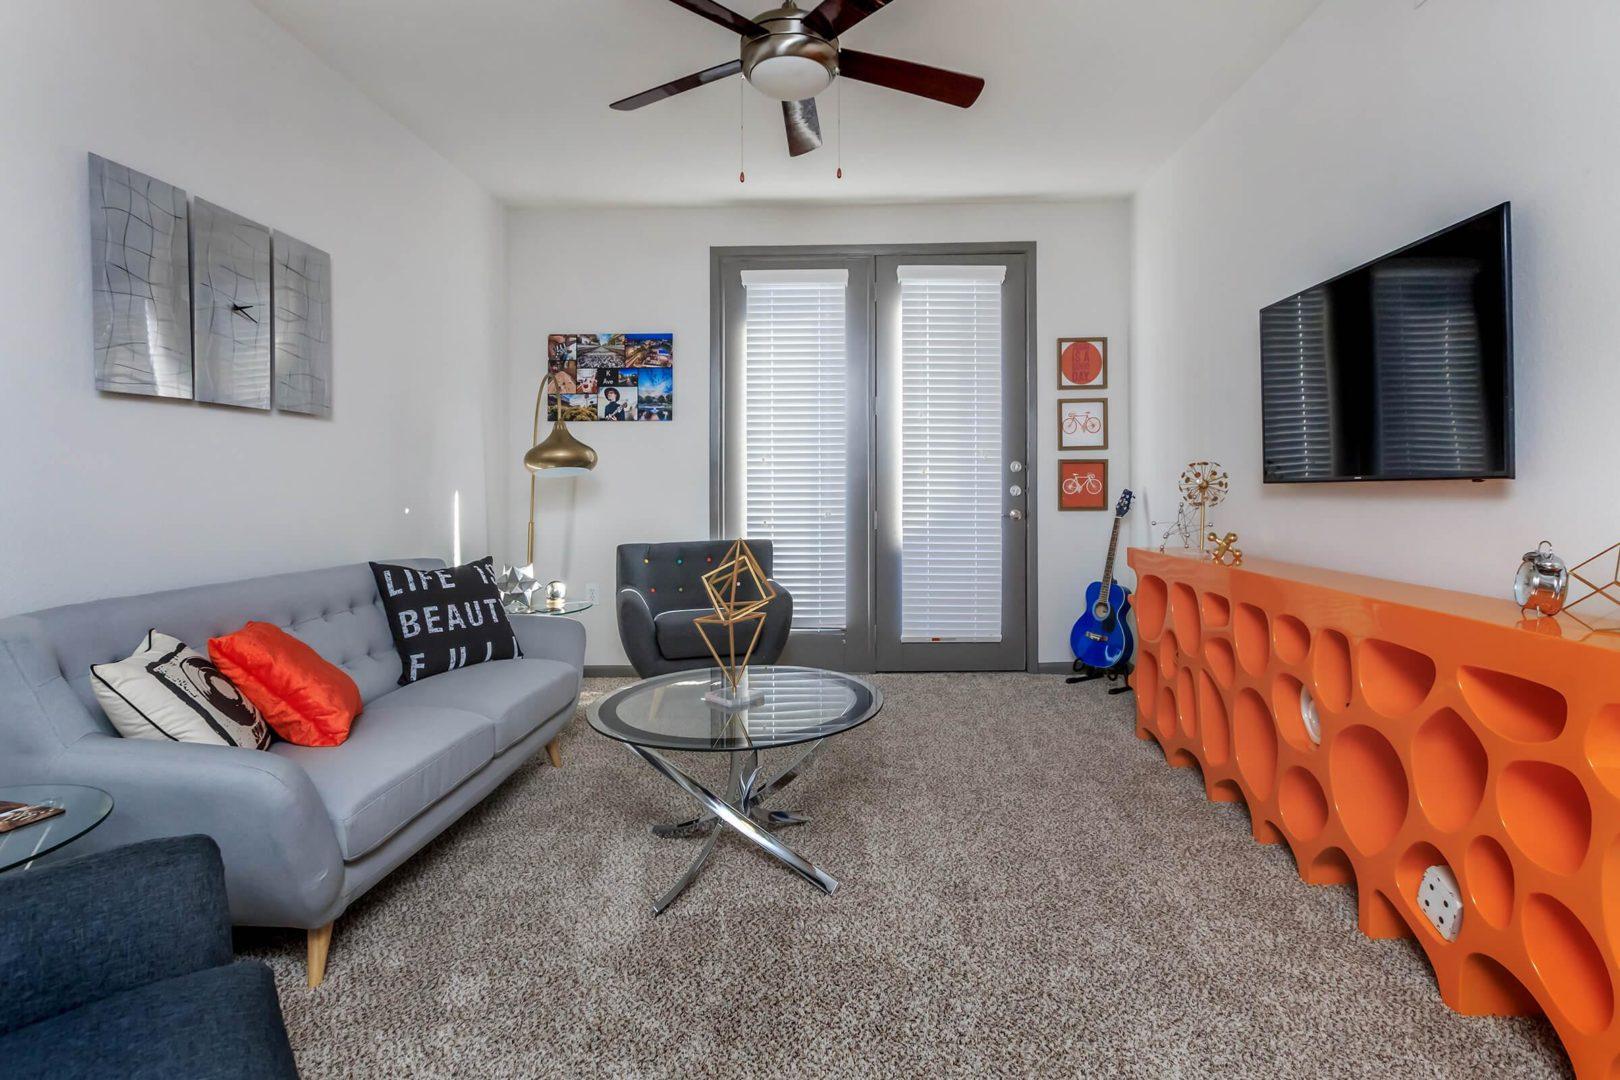 Plano 2 bedroom apartments